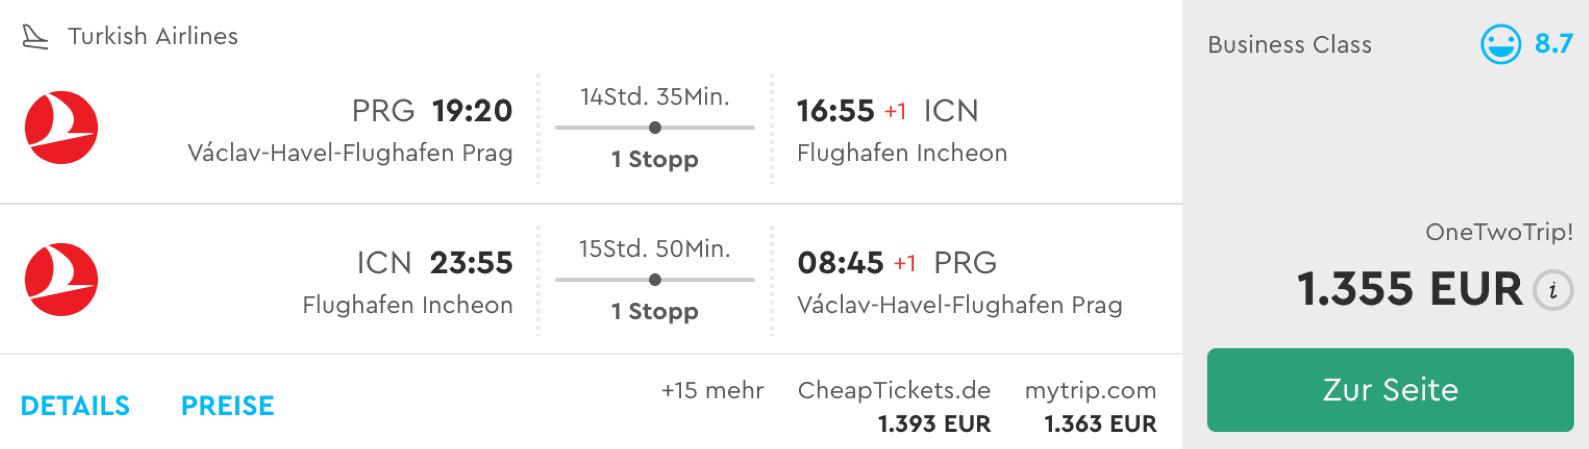 Günstige Business Class Flüge nach Seoul